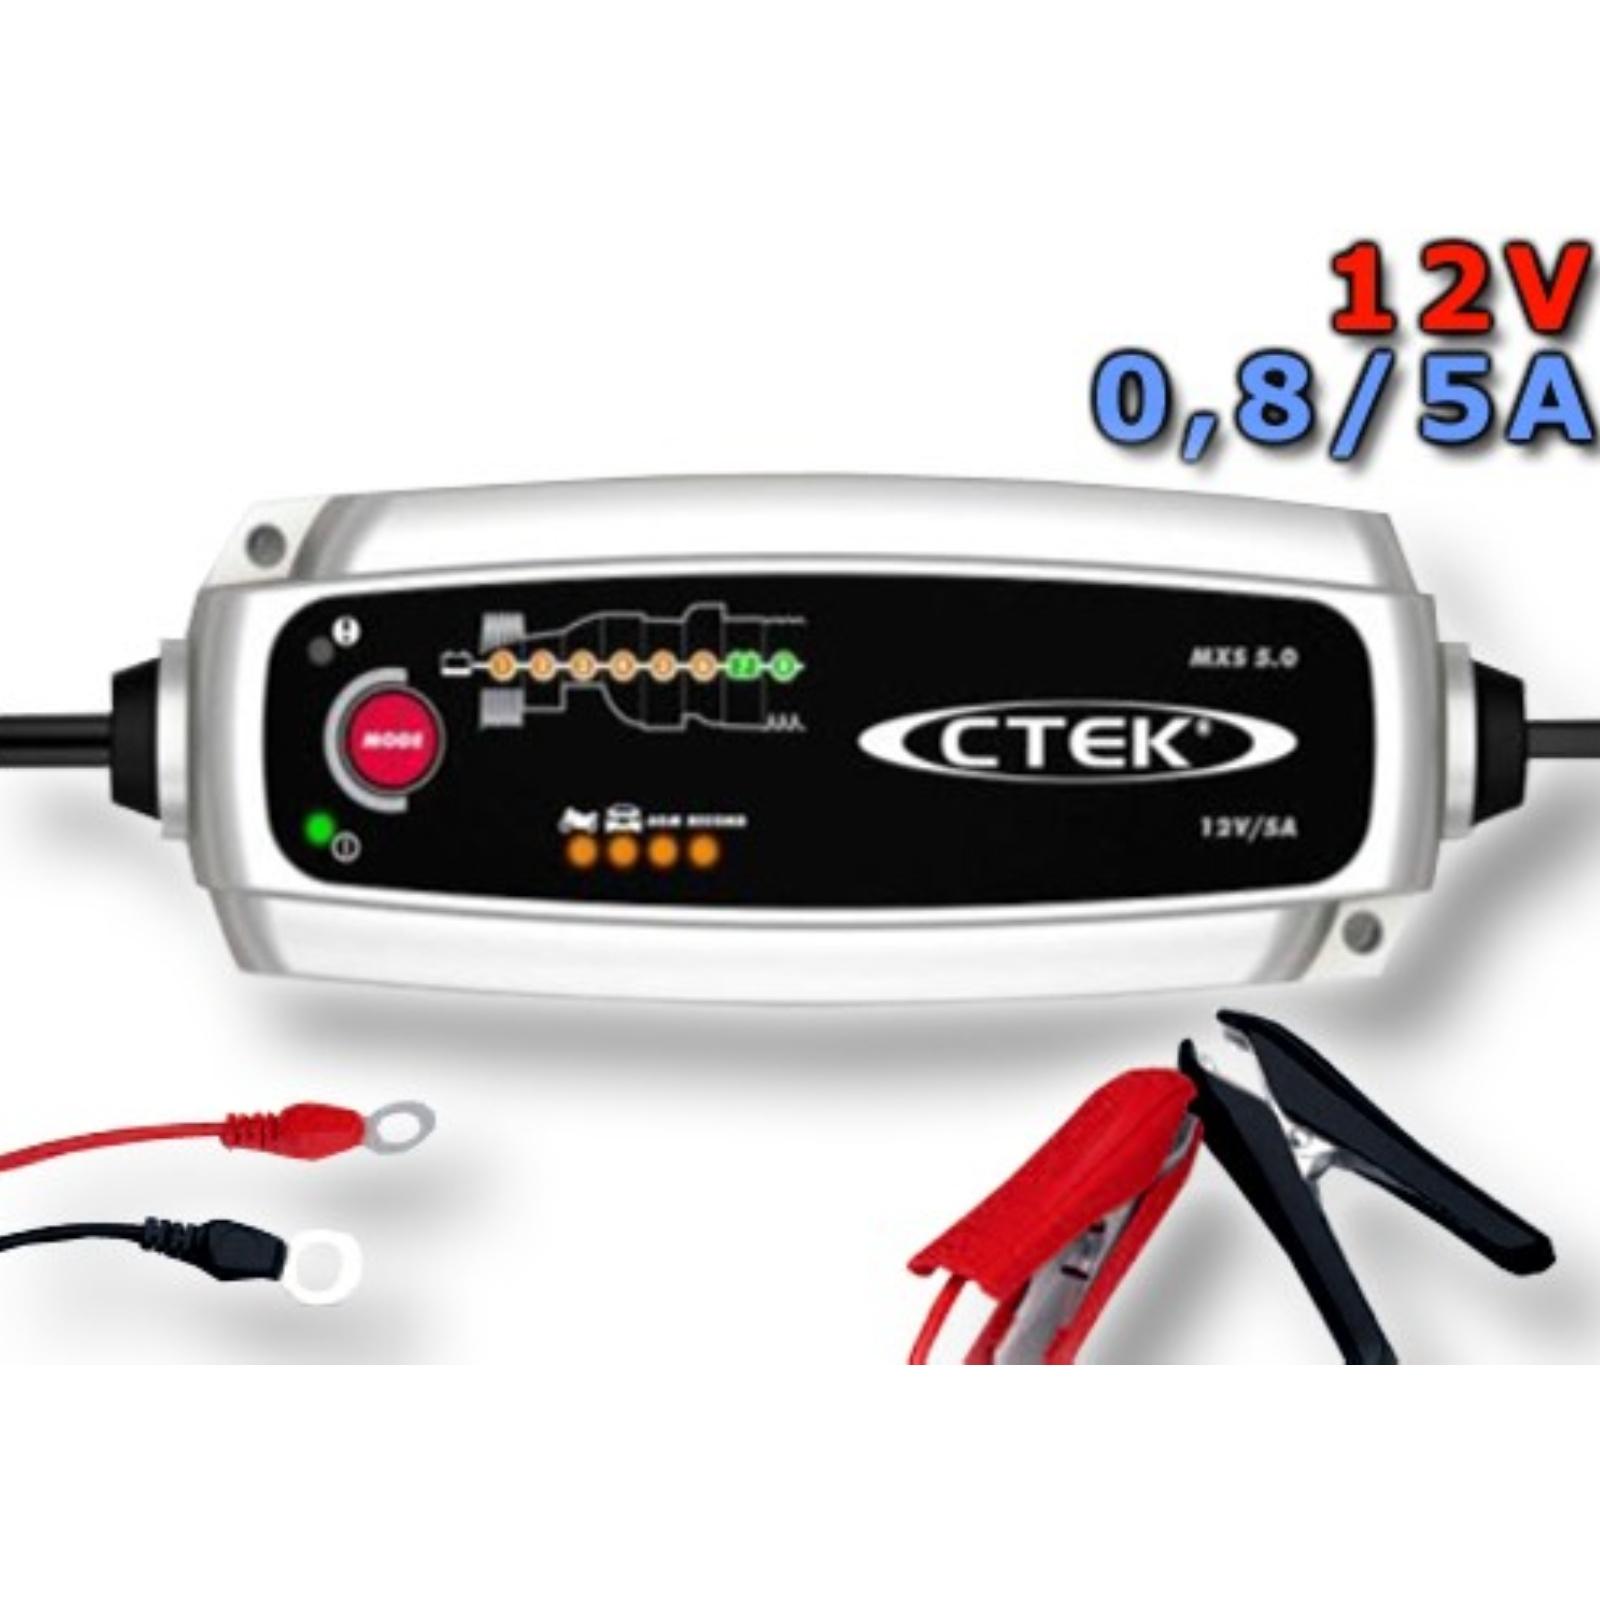 Nabíjačka CTEK MXS 5.0 s teplotným čidlom